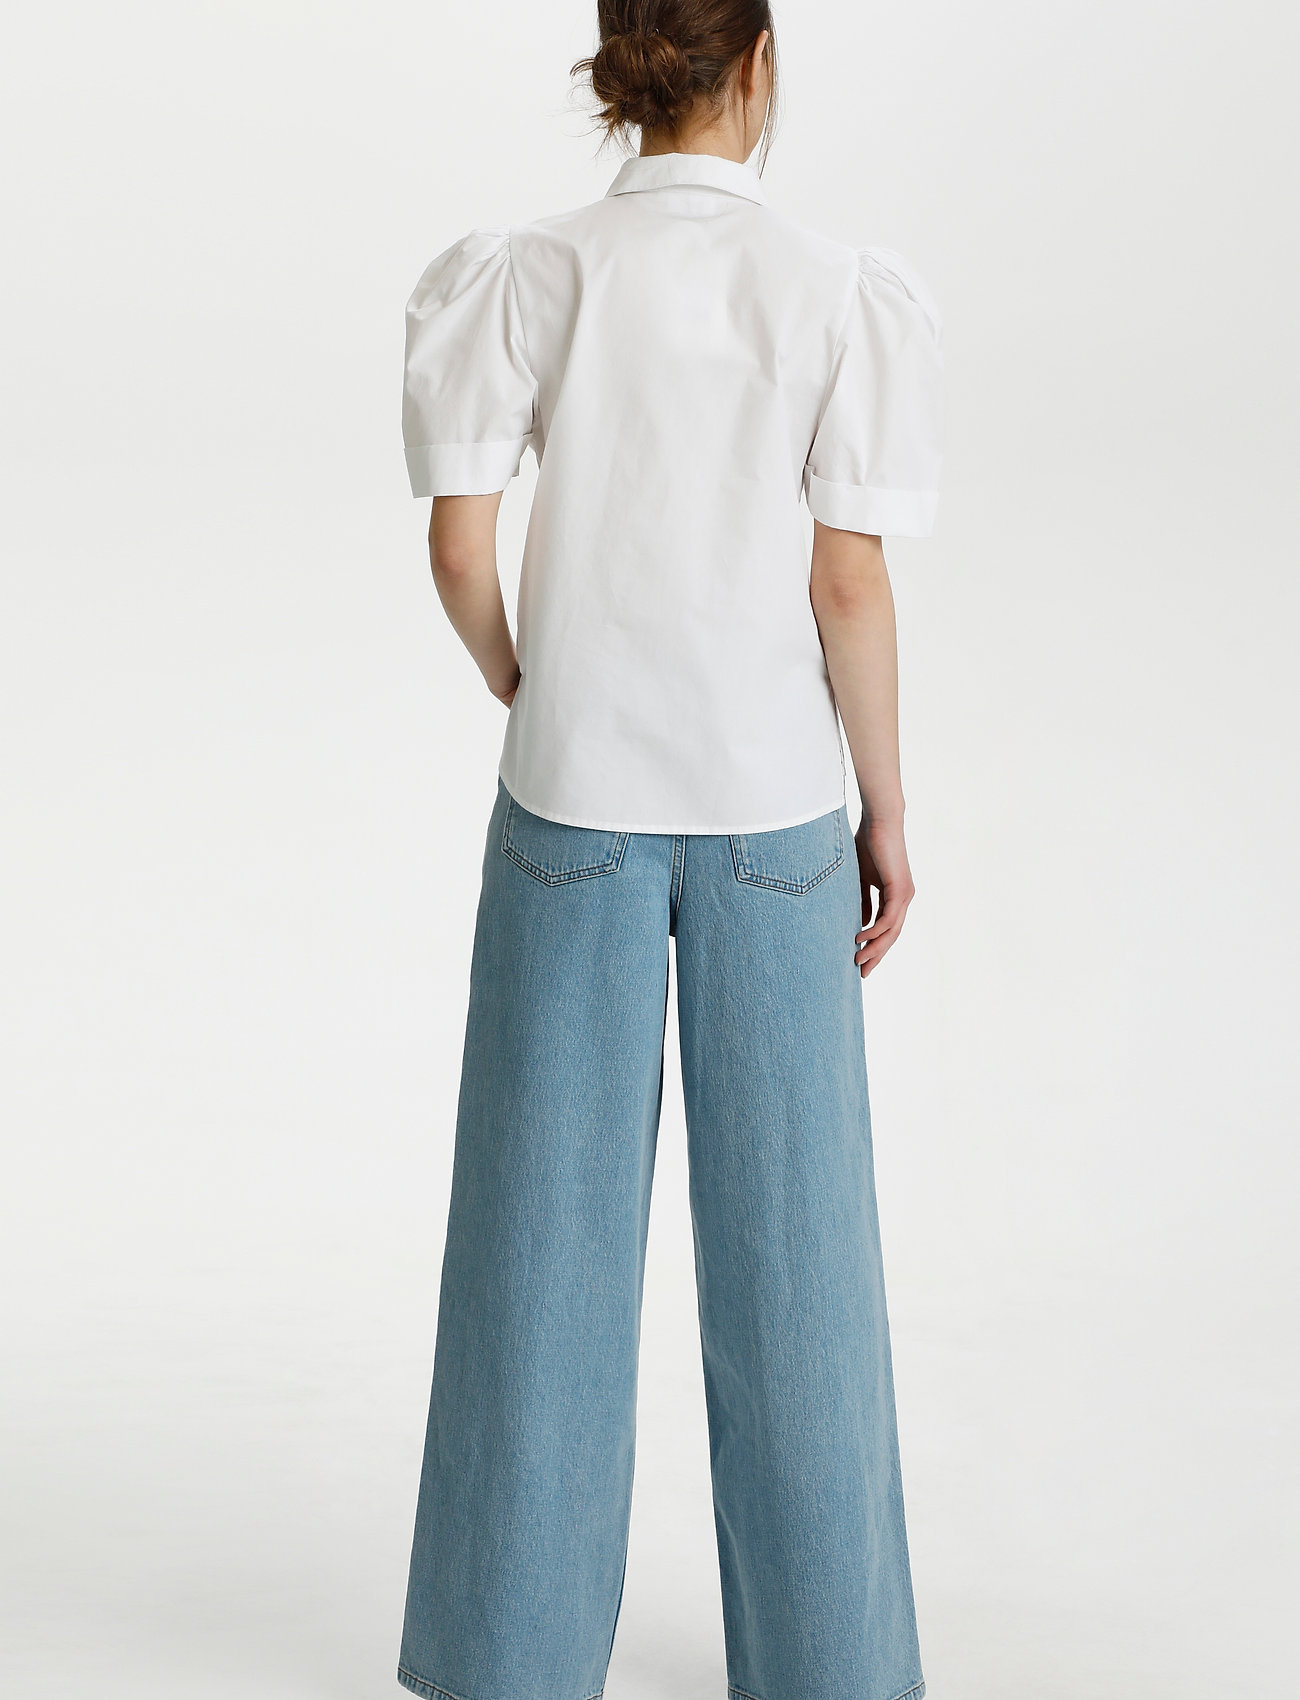 Gestuz - HalioGZ ss shirt - denimskjorter - bright white - 4